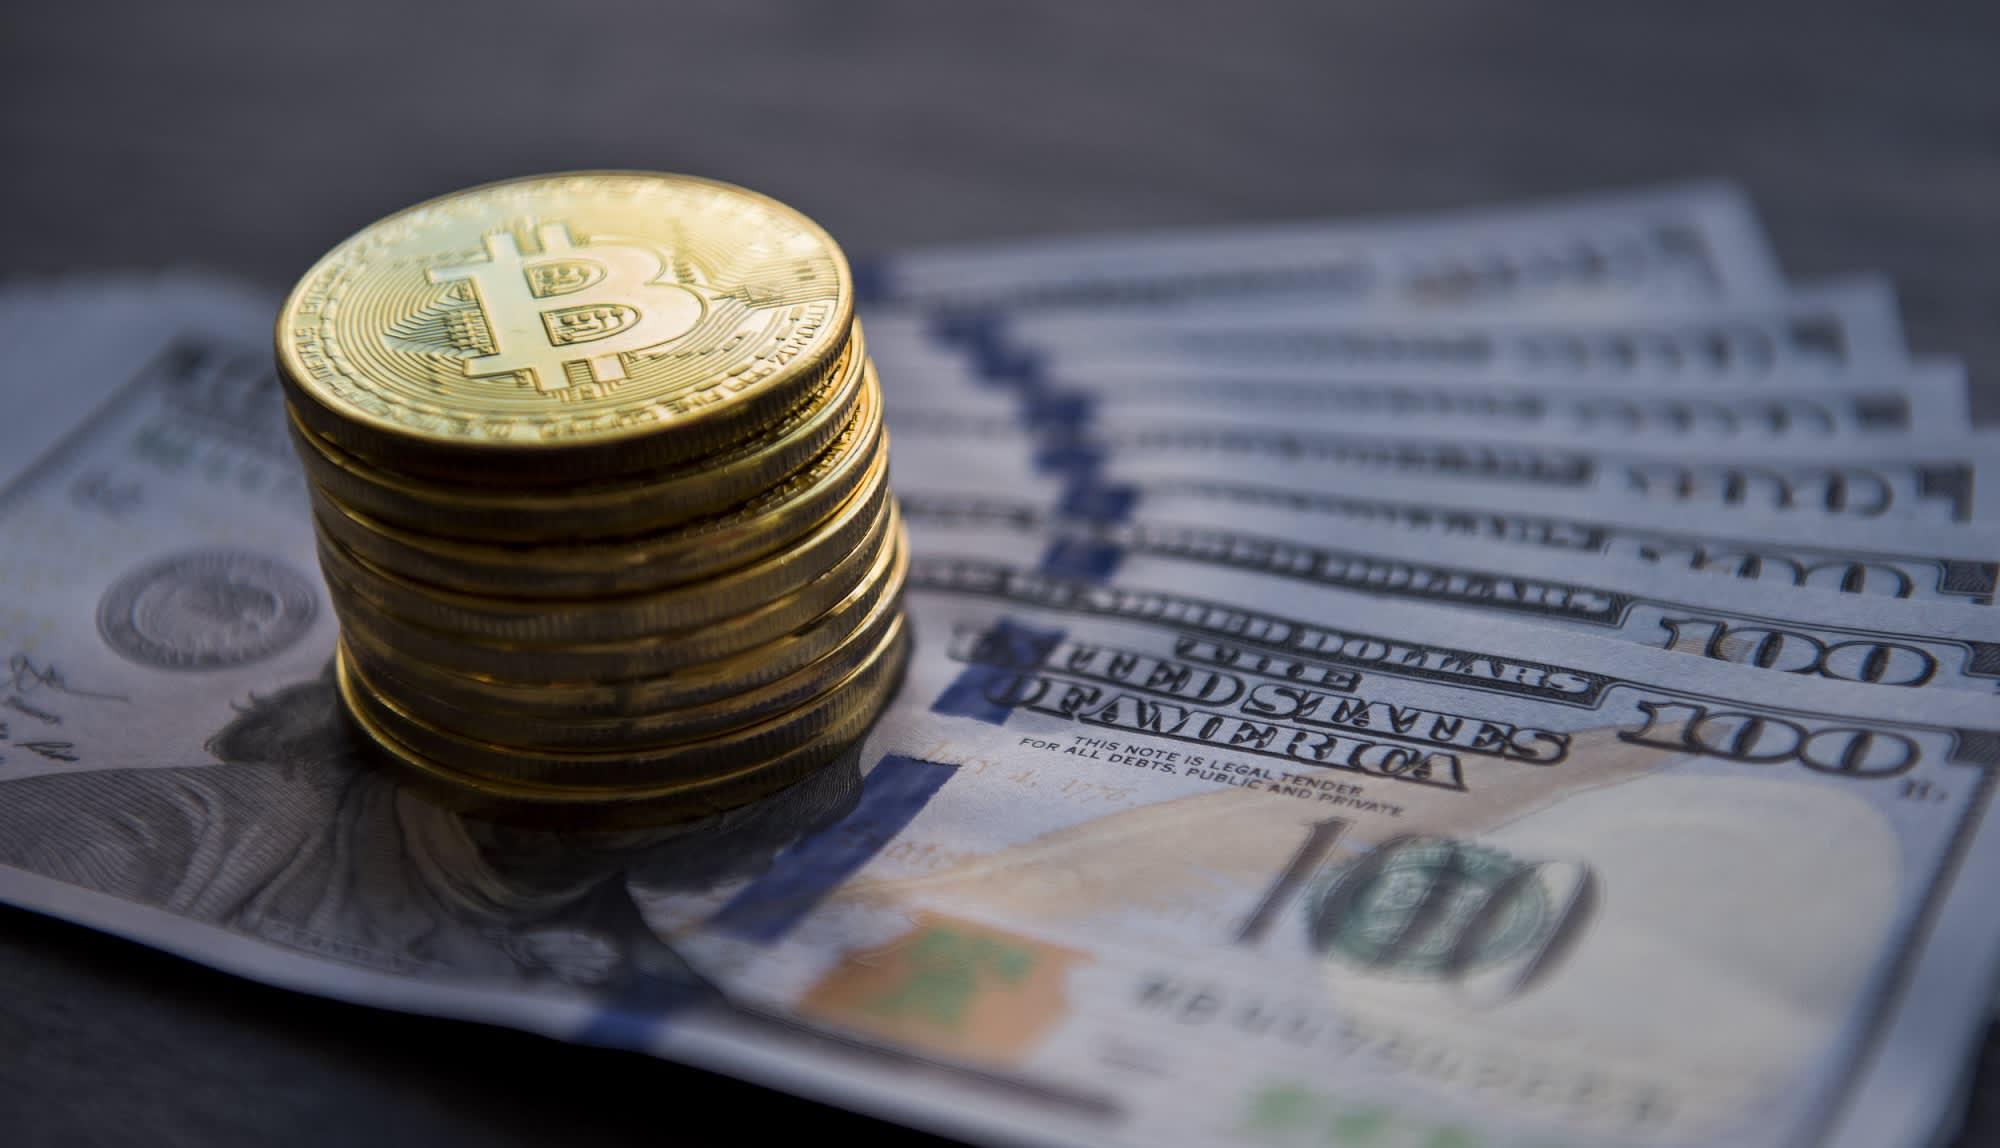 Bittrex exchange will let investors swap their dollars for